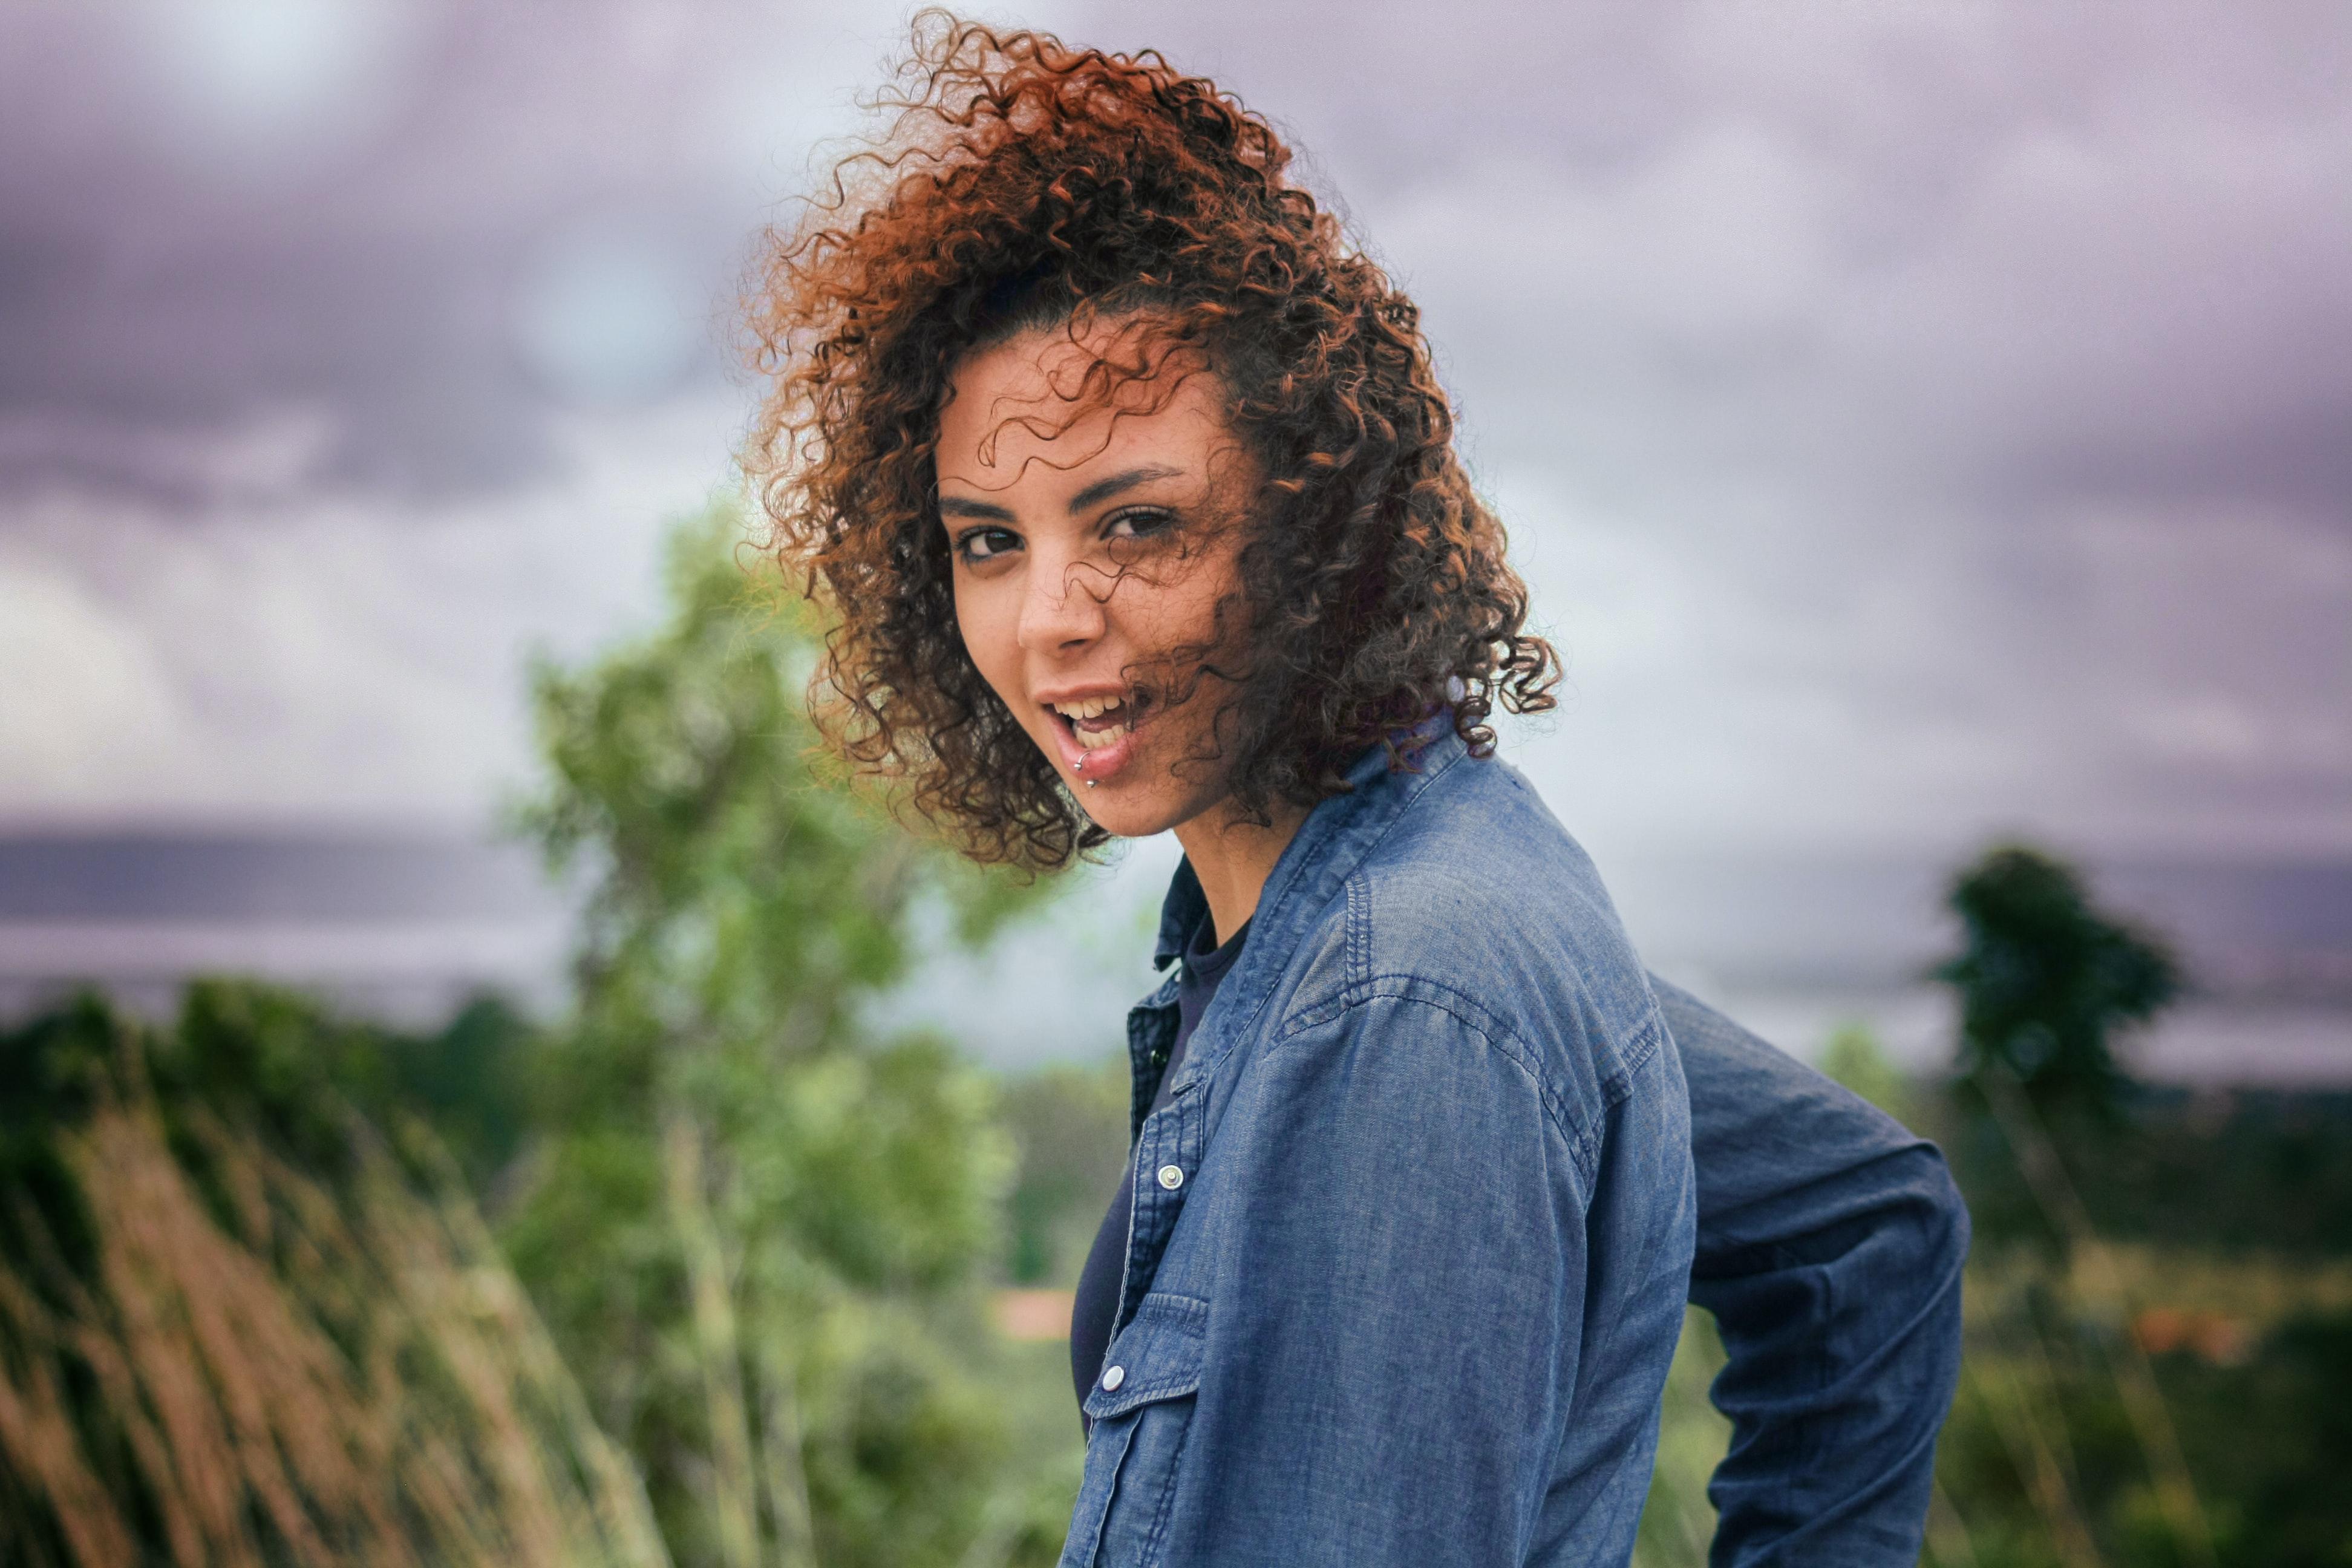 Curly Hair Series: Curly/Coily Hair Regimens